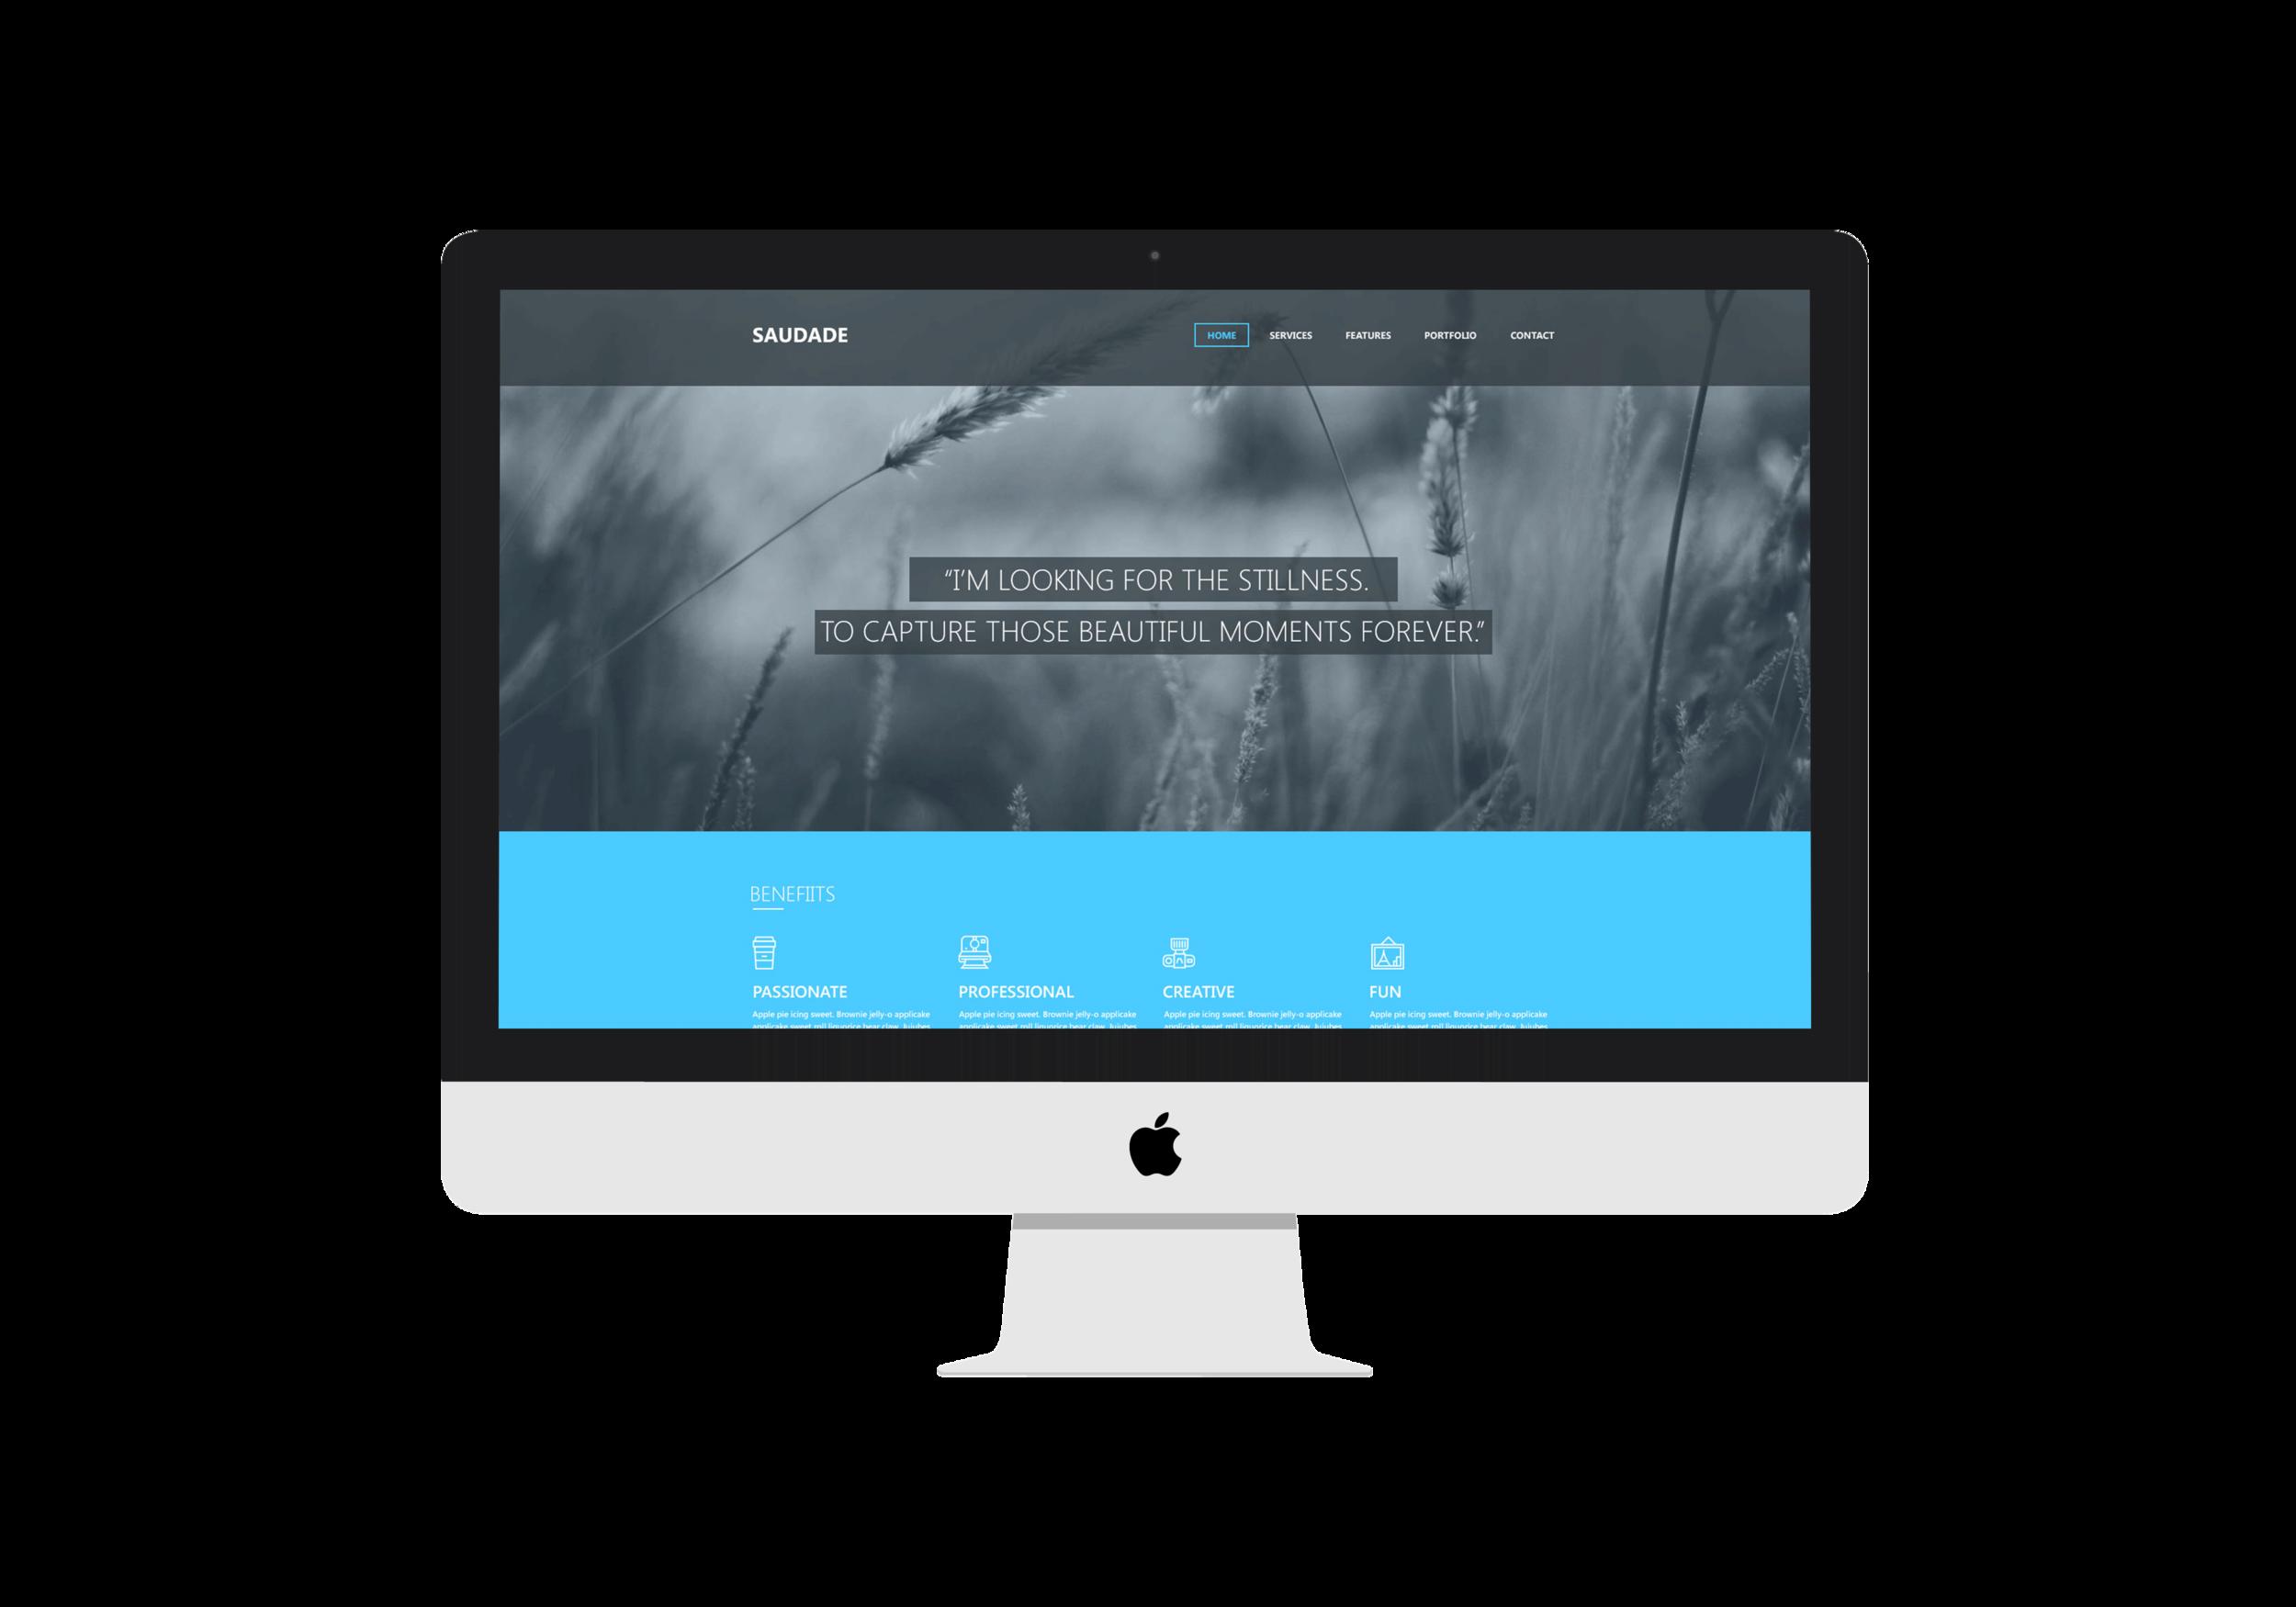 Saudade-Website-Mockup.png